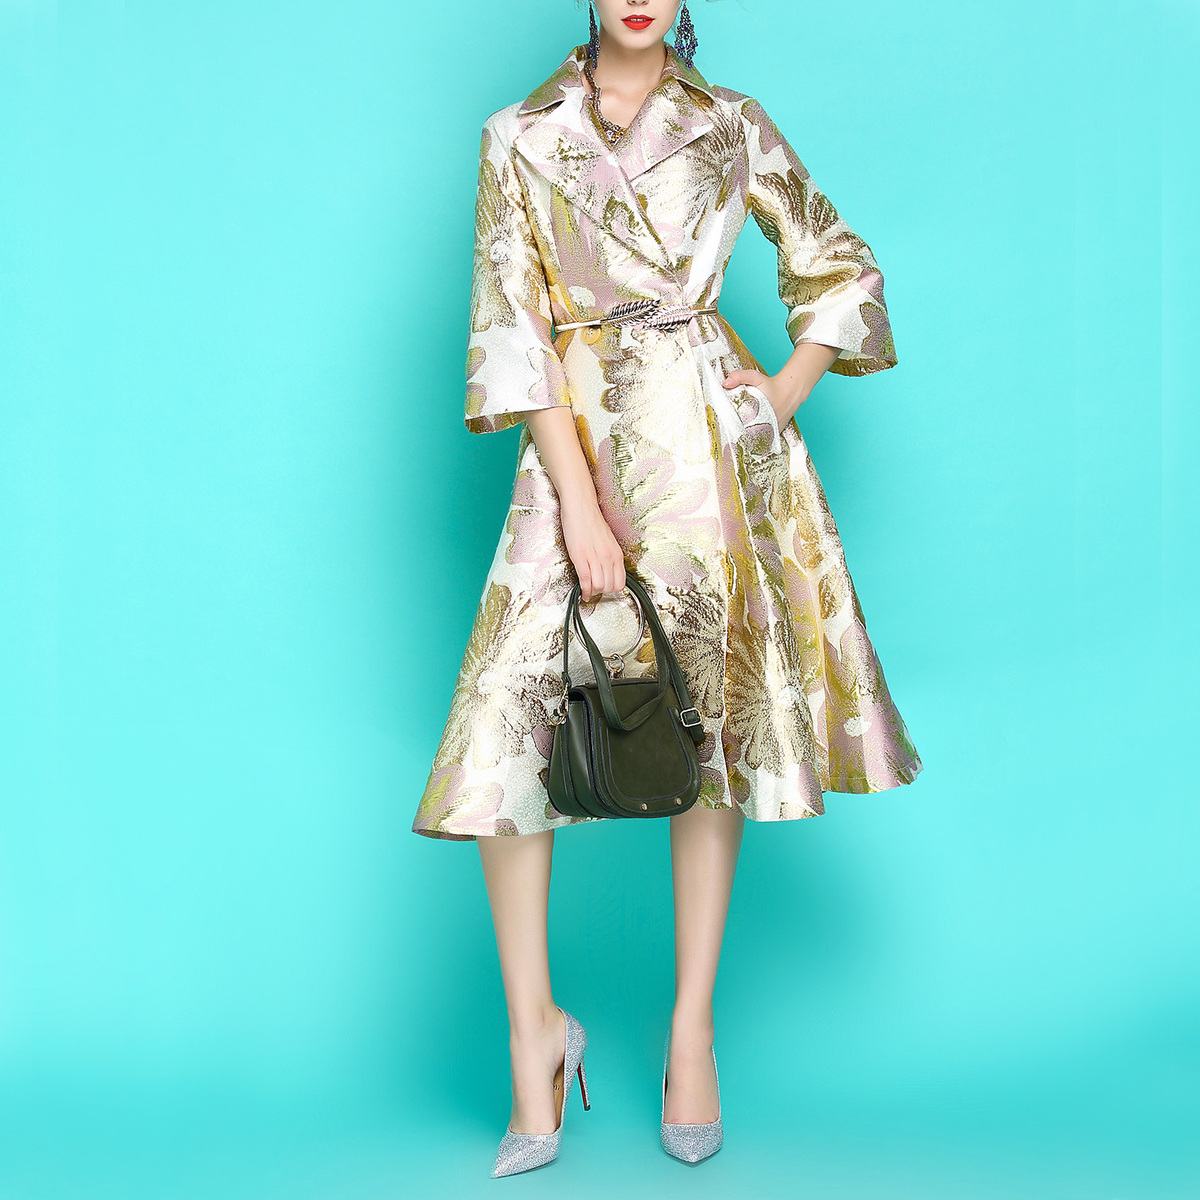 2018 New Fashion Autumn Vintage Women's Purple Jacquard Embroidery Luxury Windbreaker Long   Trench   Coat 3/4 Sleeve Slim Outwear